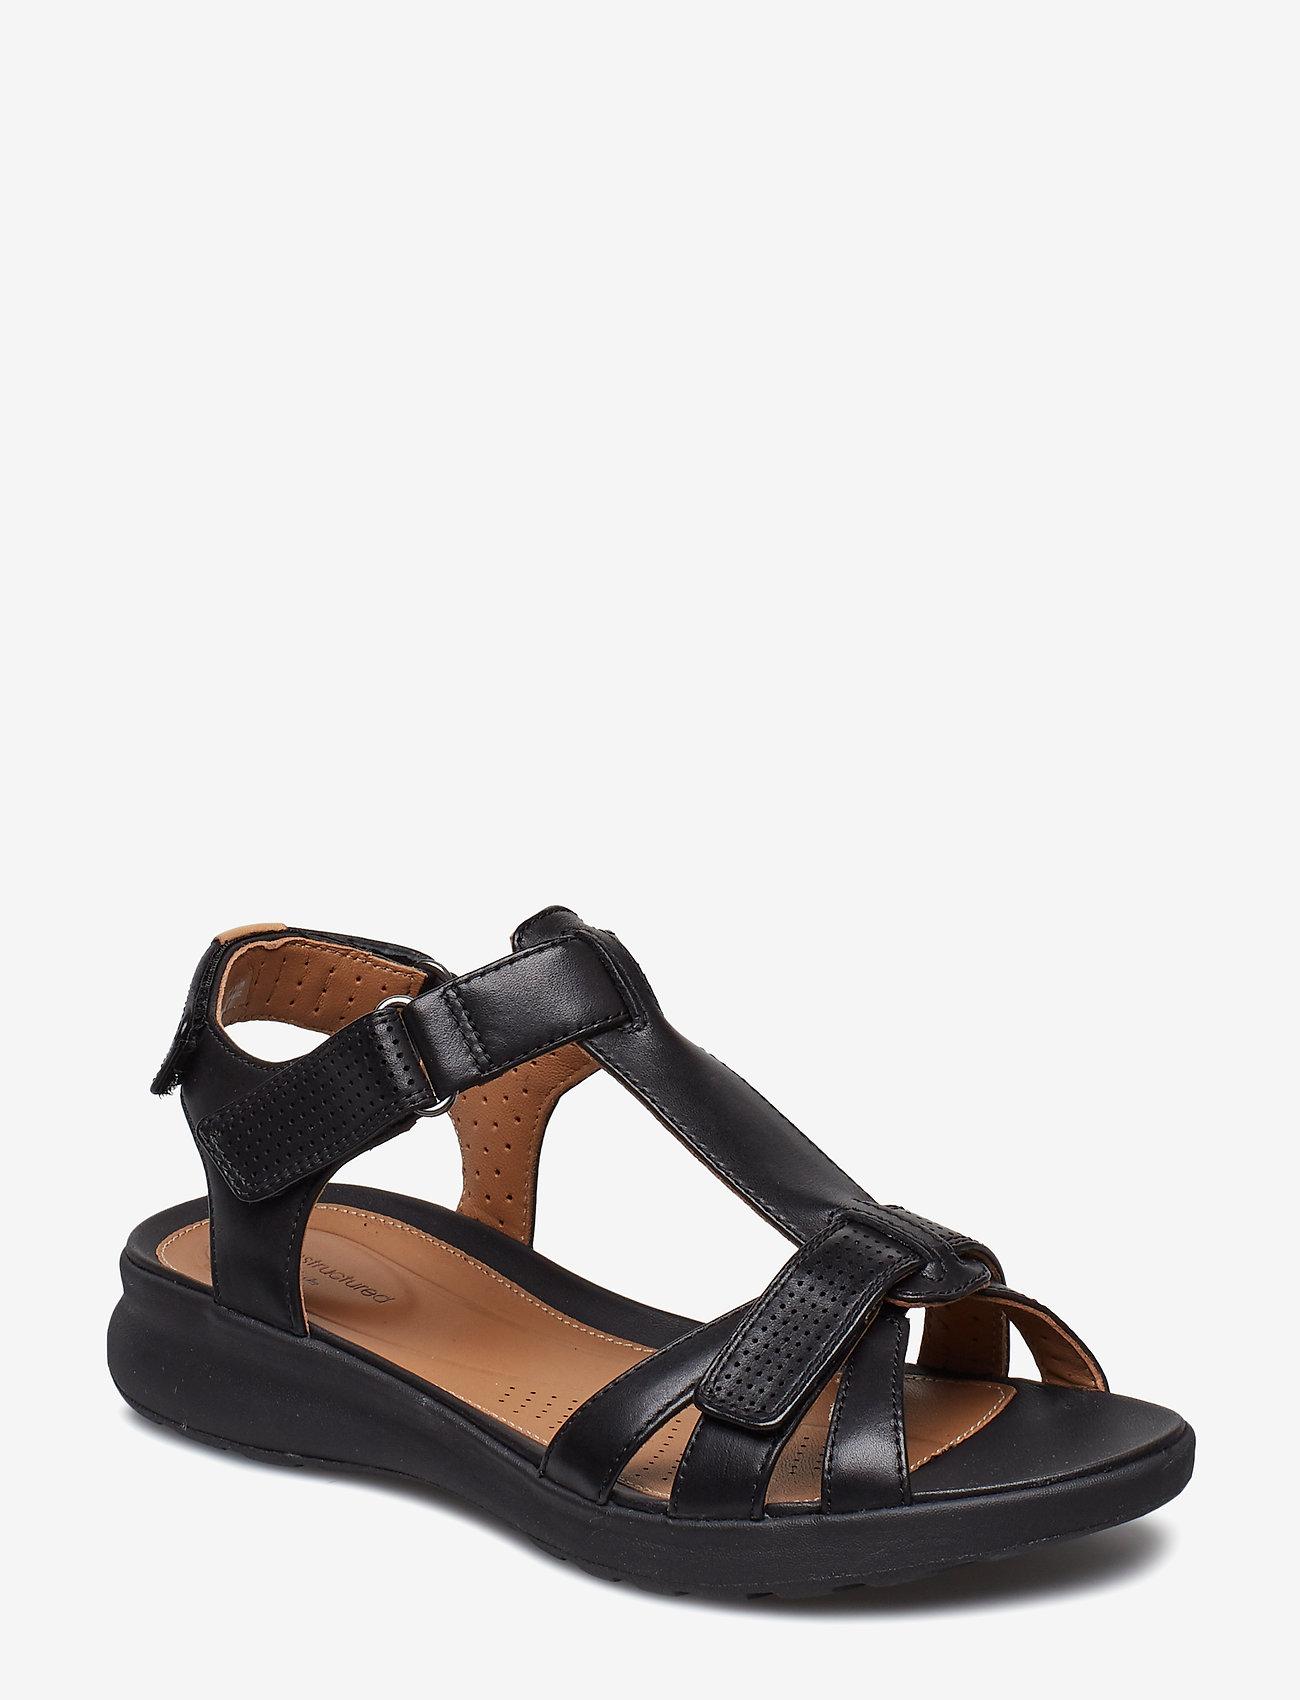 Clarks - Un Adorn Vibe - matalat sandaalit - black leather